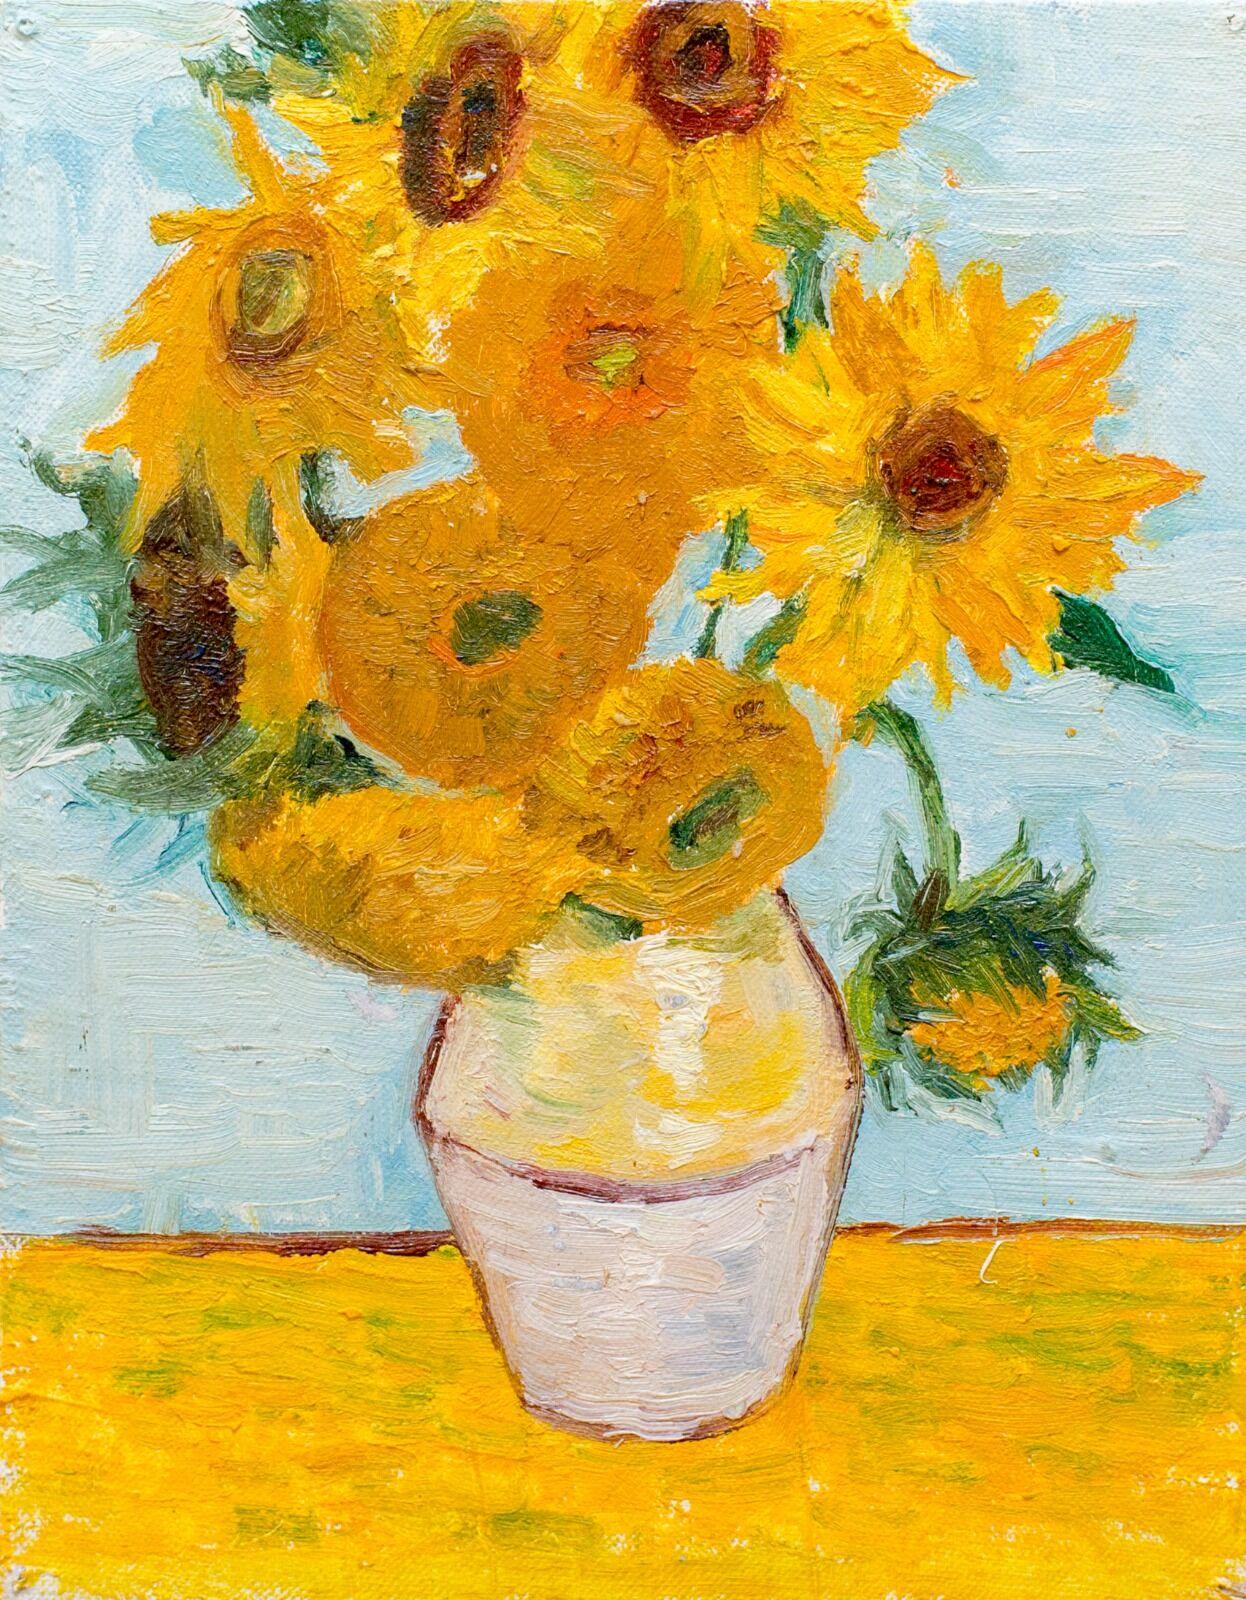 Inspired by Van Gogh